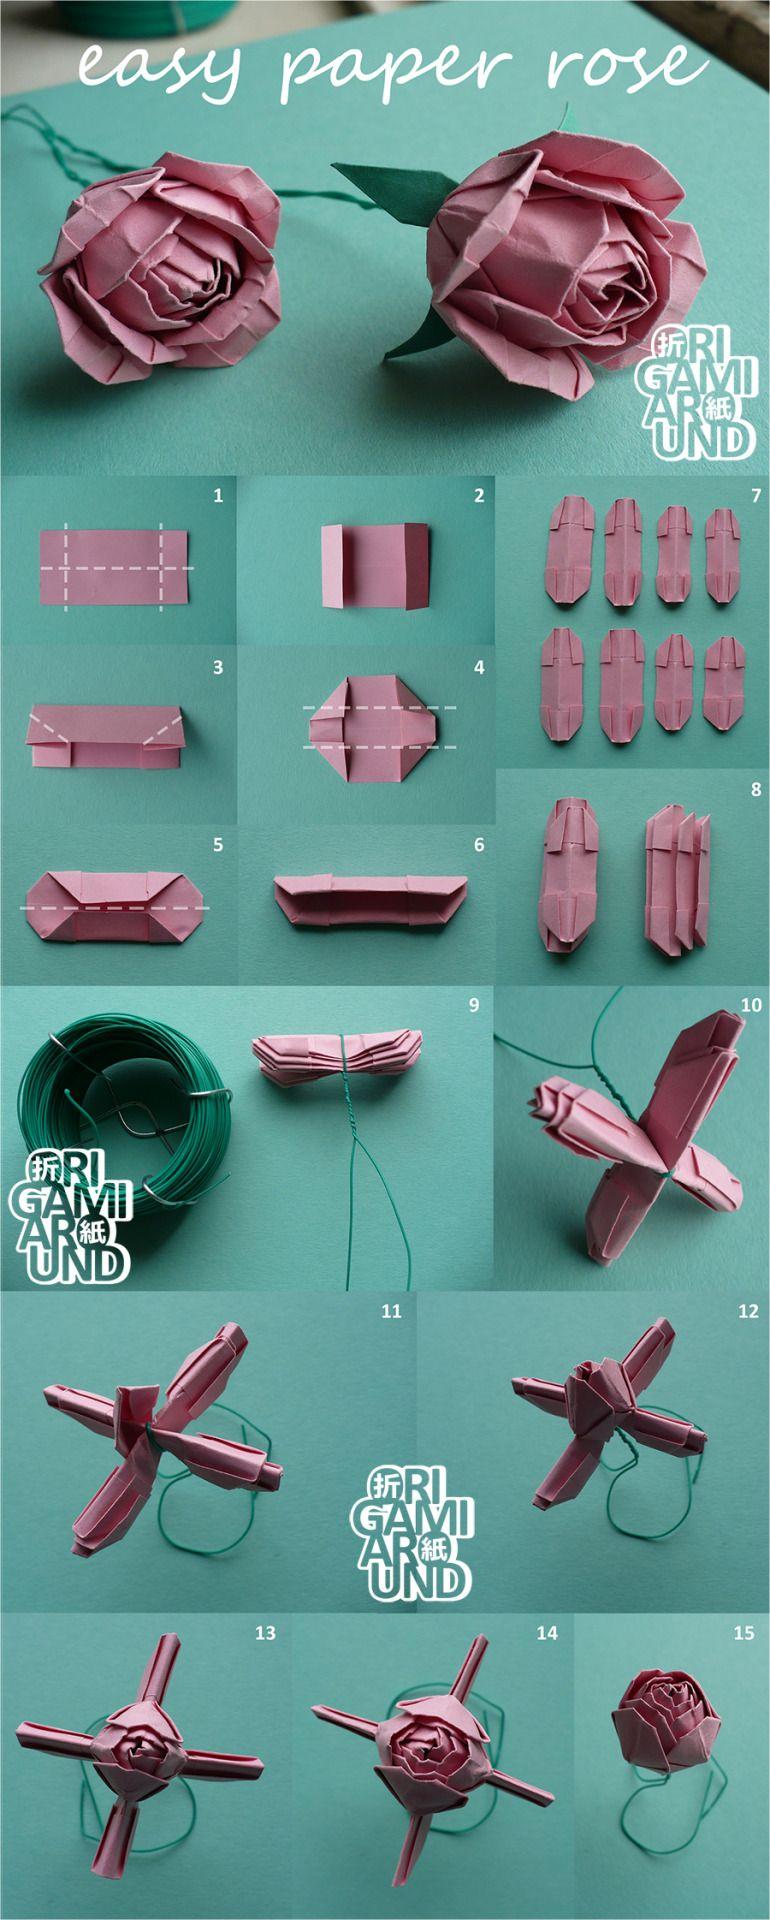 Origami violet tutorial recut making leaves yellow version diy